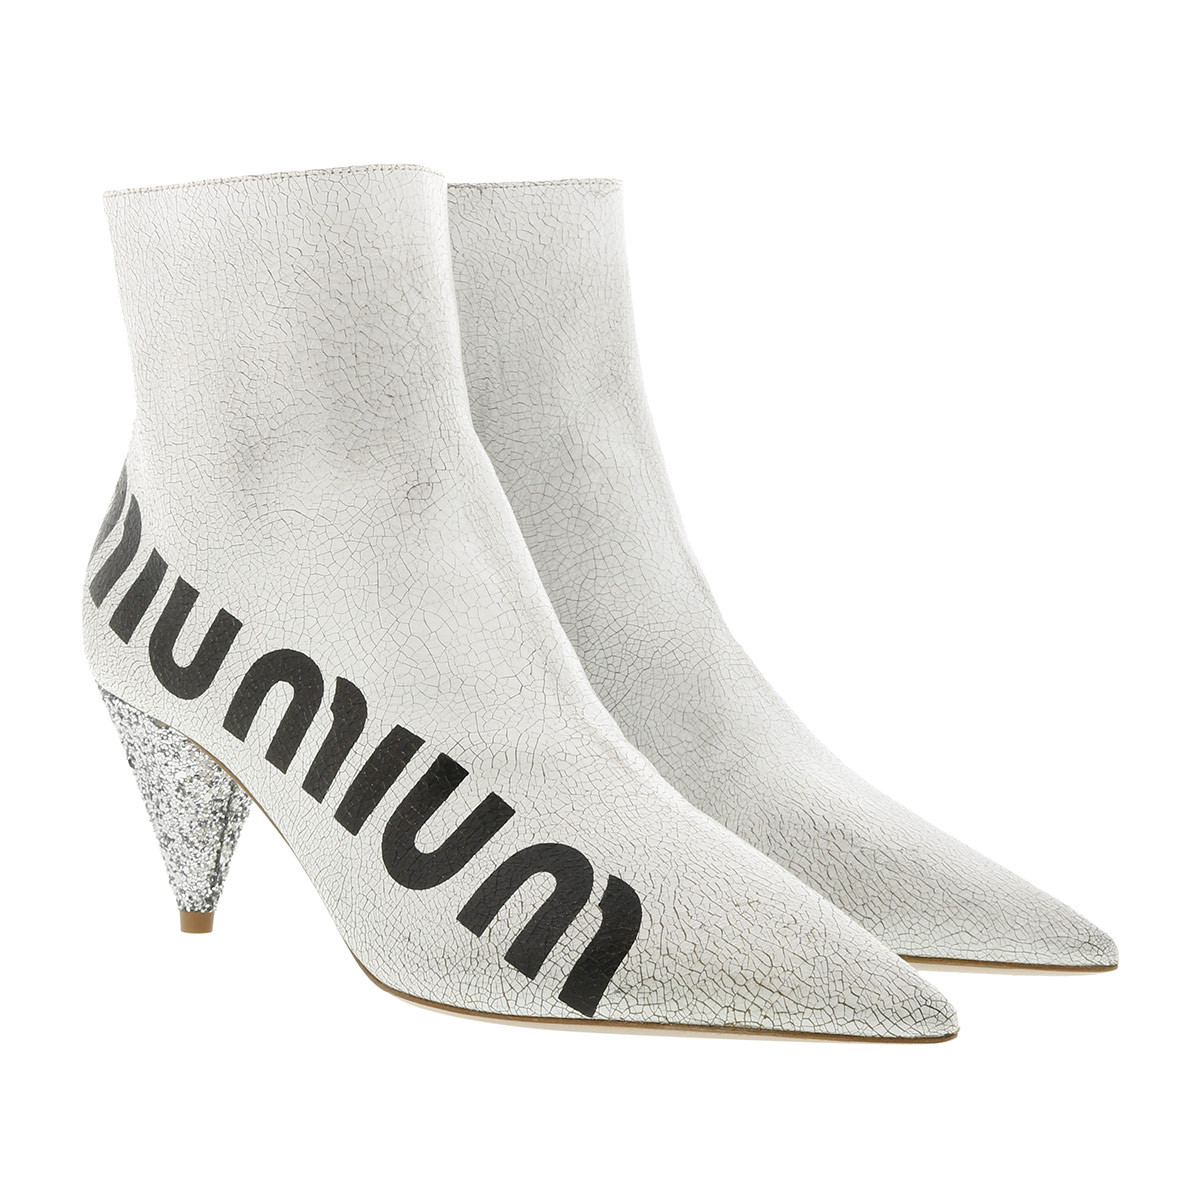 Miu Miu Boots - Casual Style Ankle Boots White/Silver - in weiß - für Damen